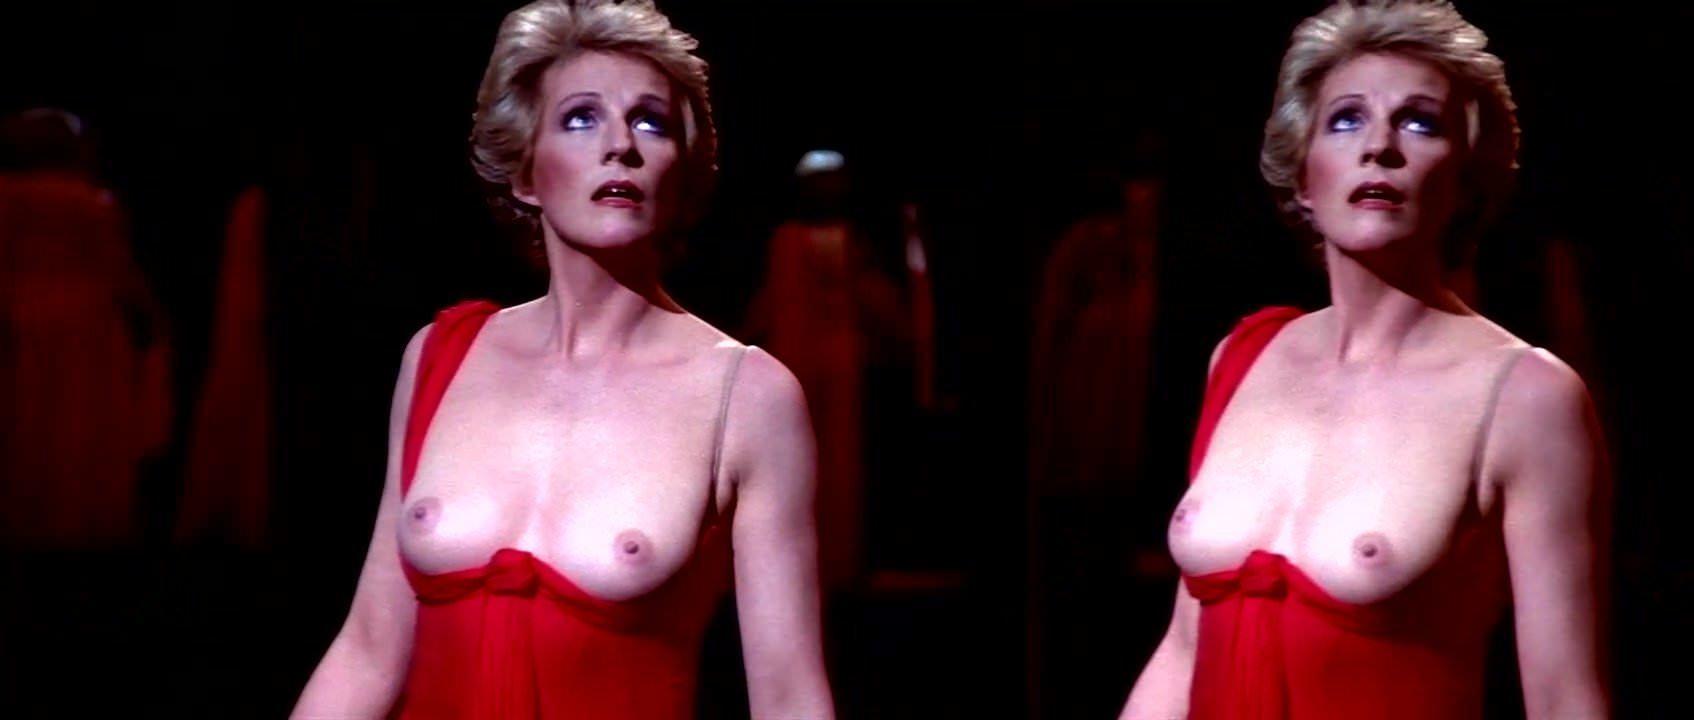 Julie Andrews Topless